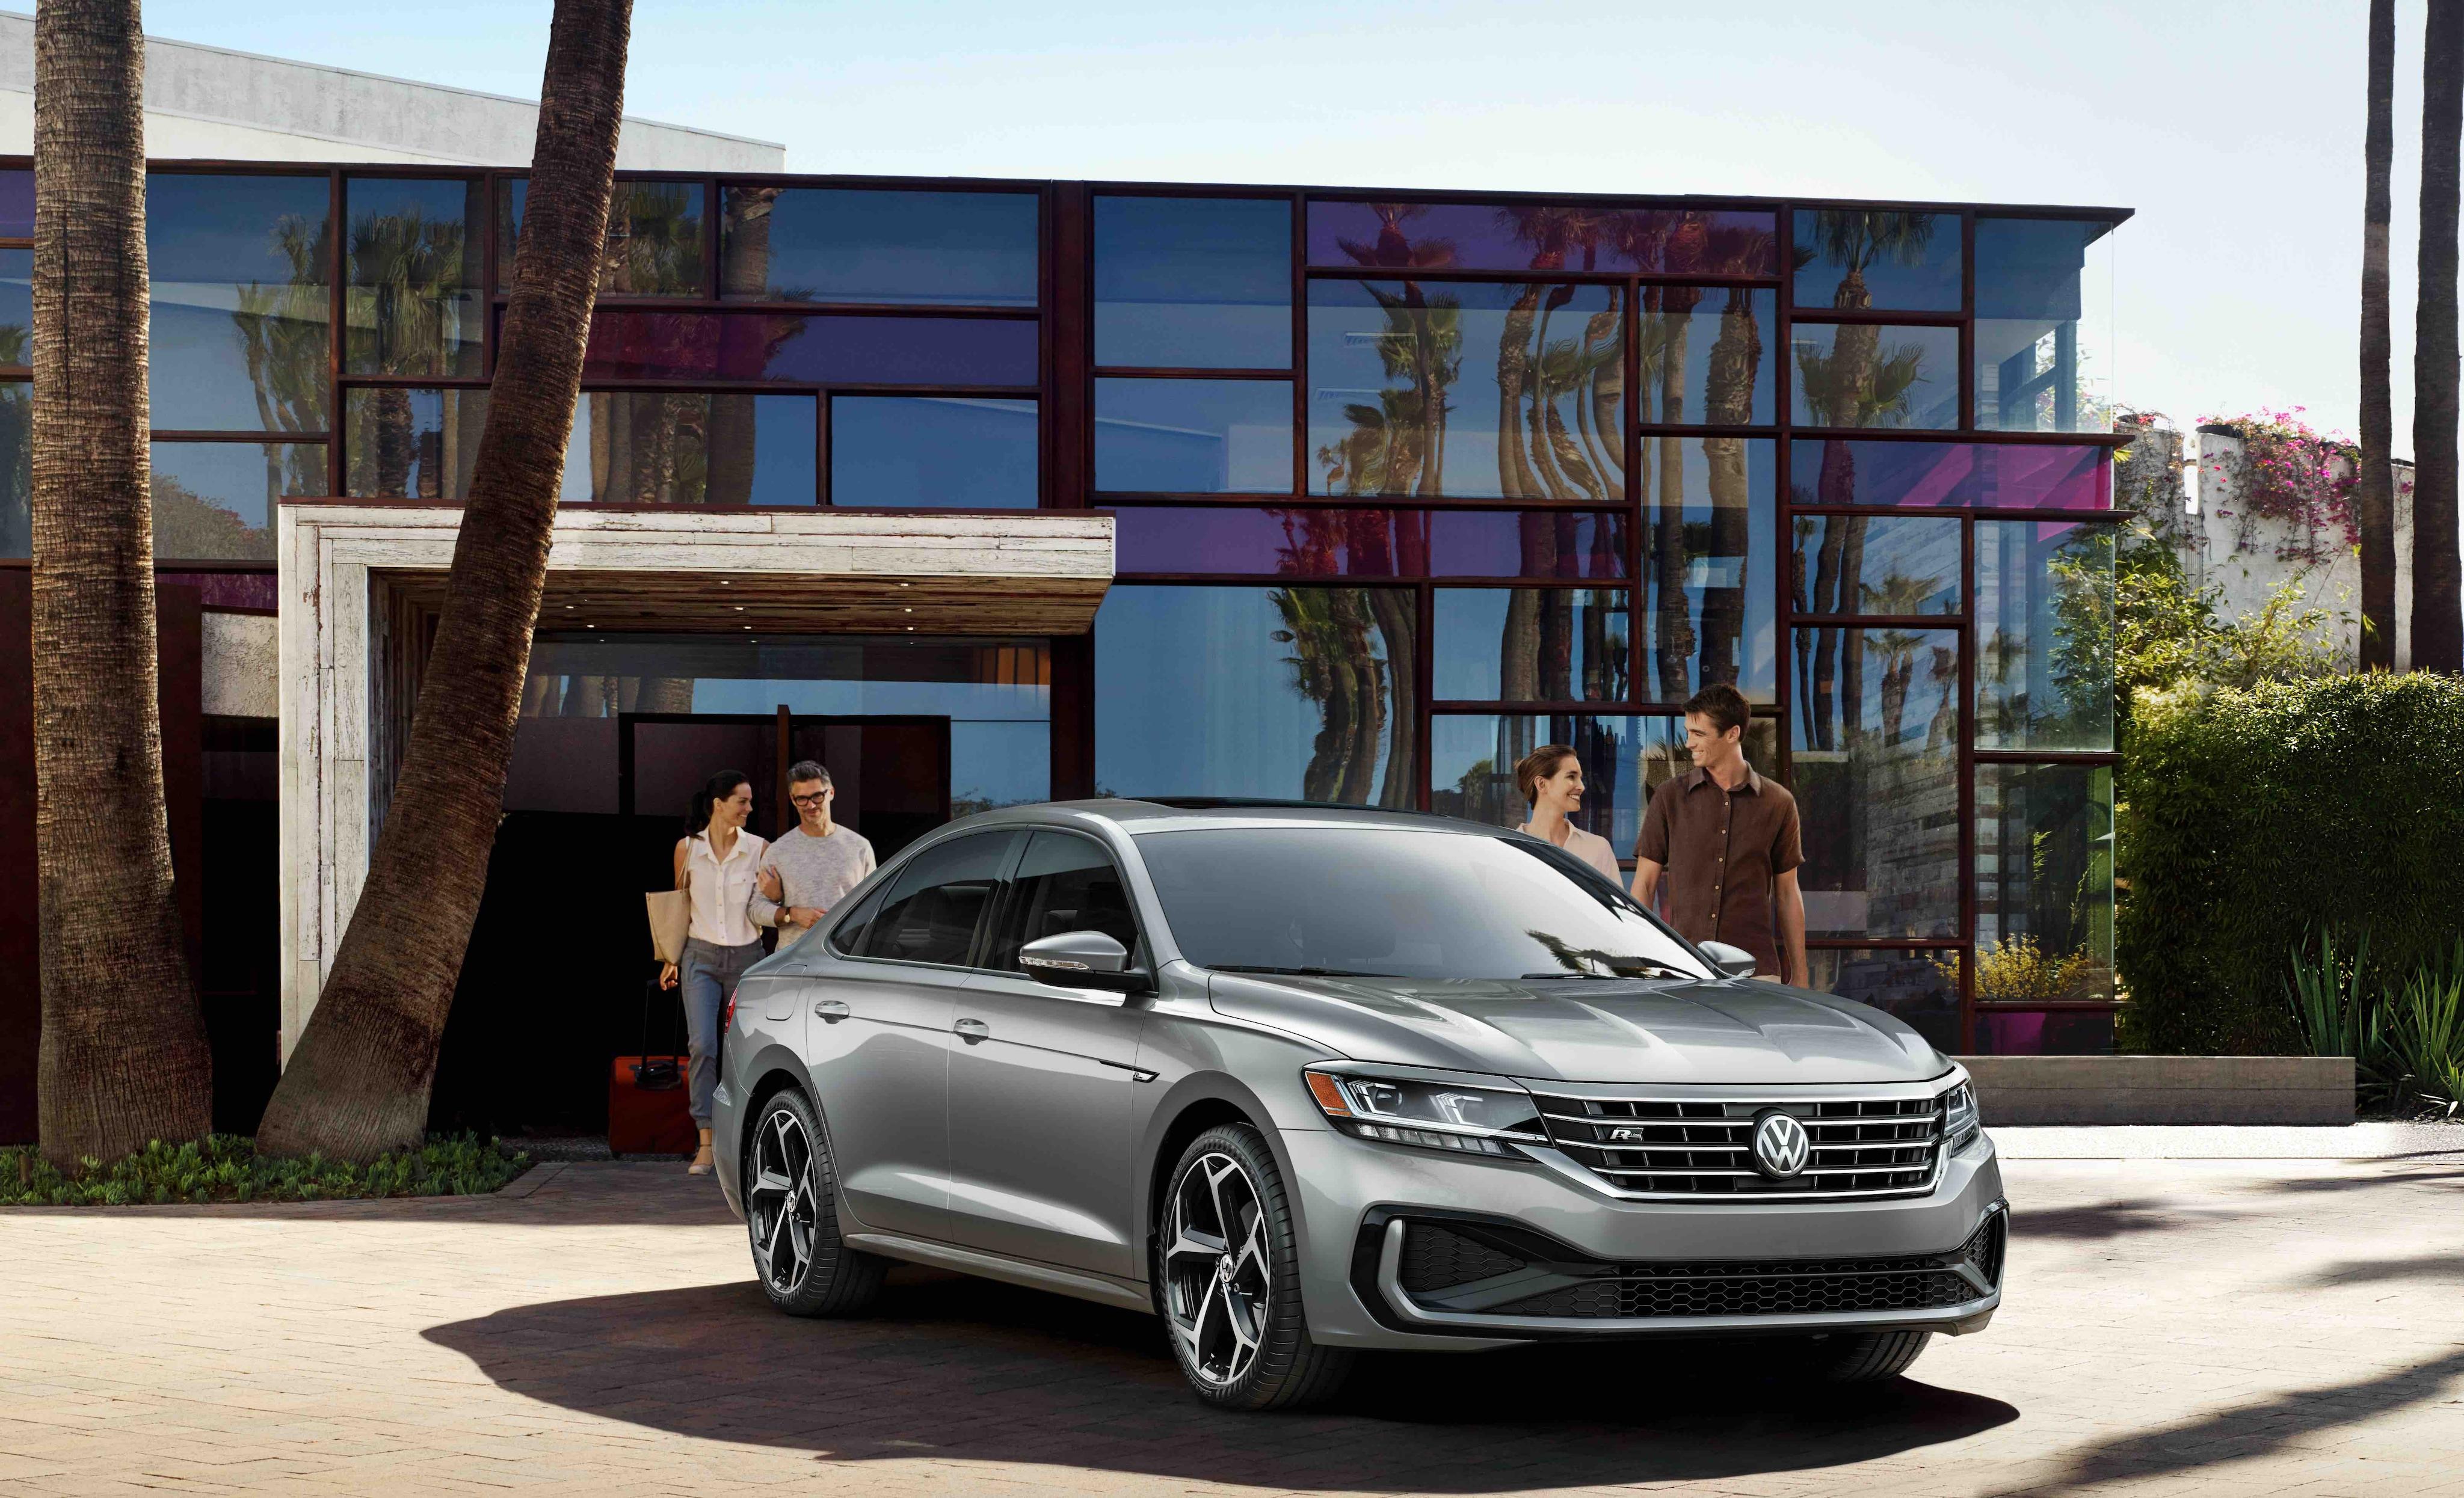 2020 VW Passat R-Line Gray Outdoors Luxury House